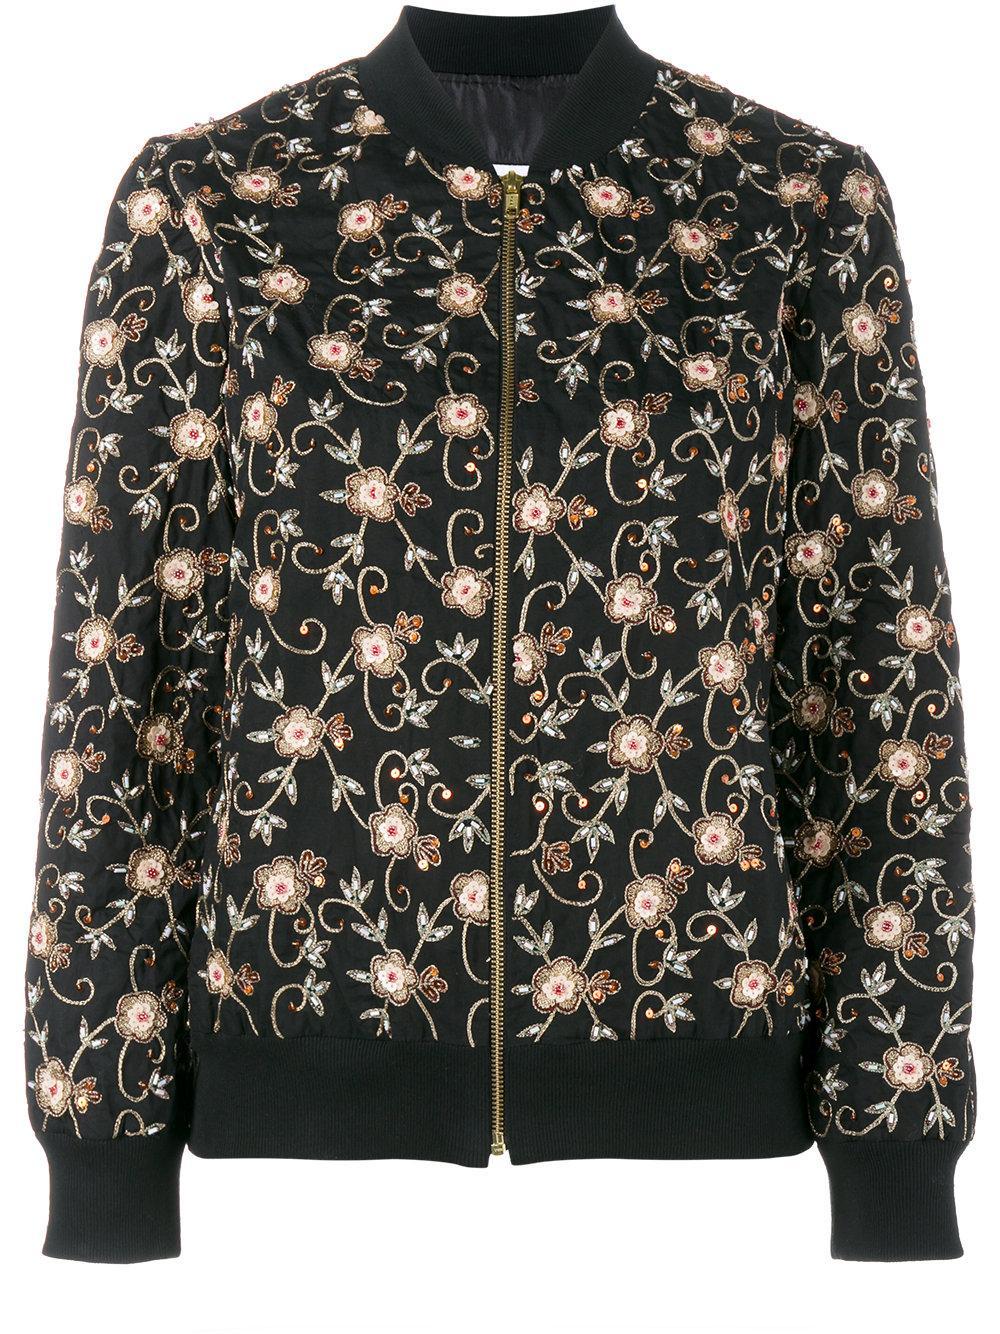 Ashish floral embroidered bomber jacket in black save